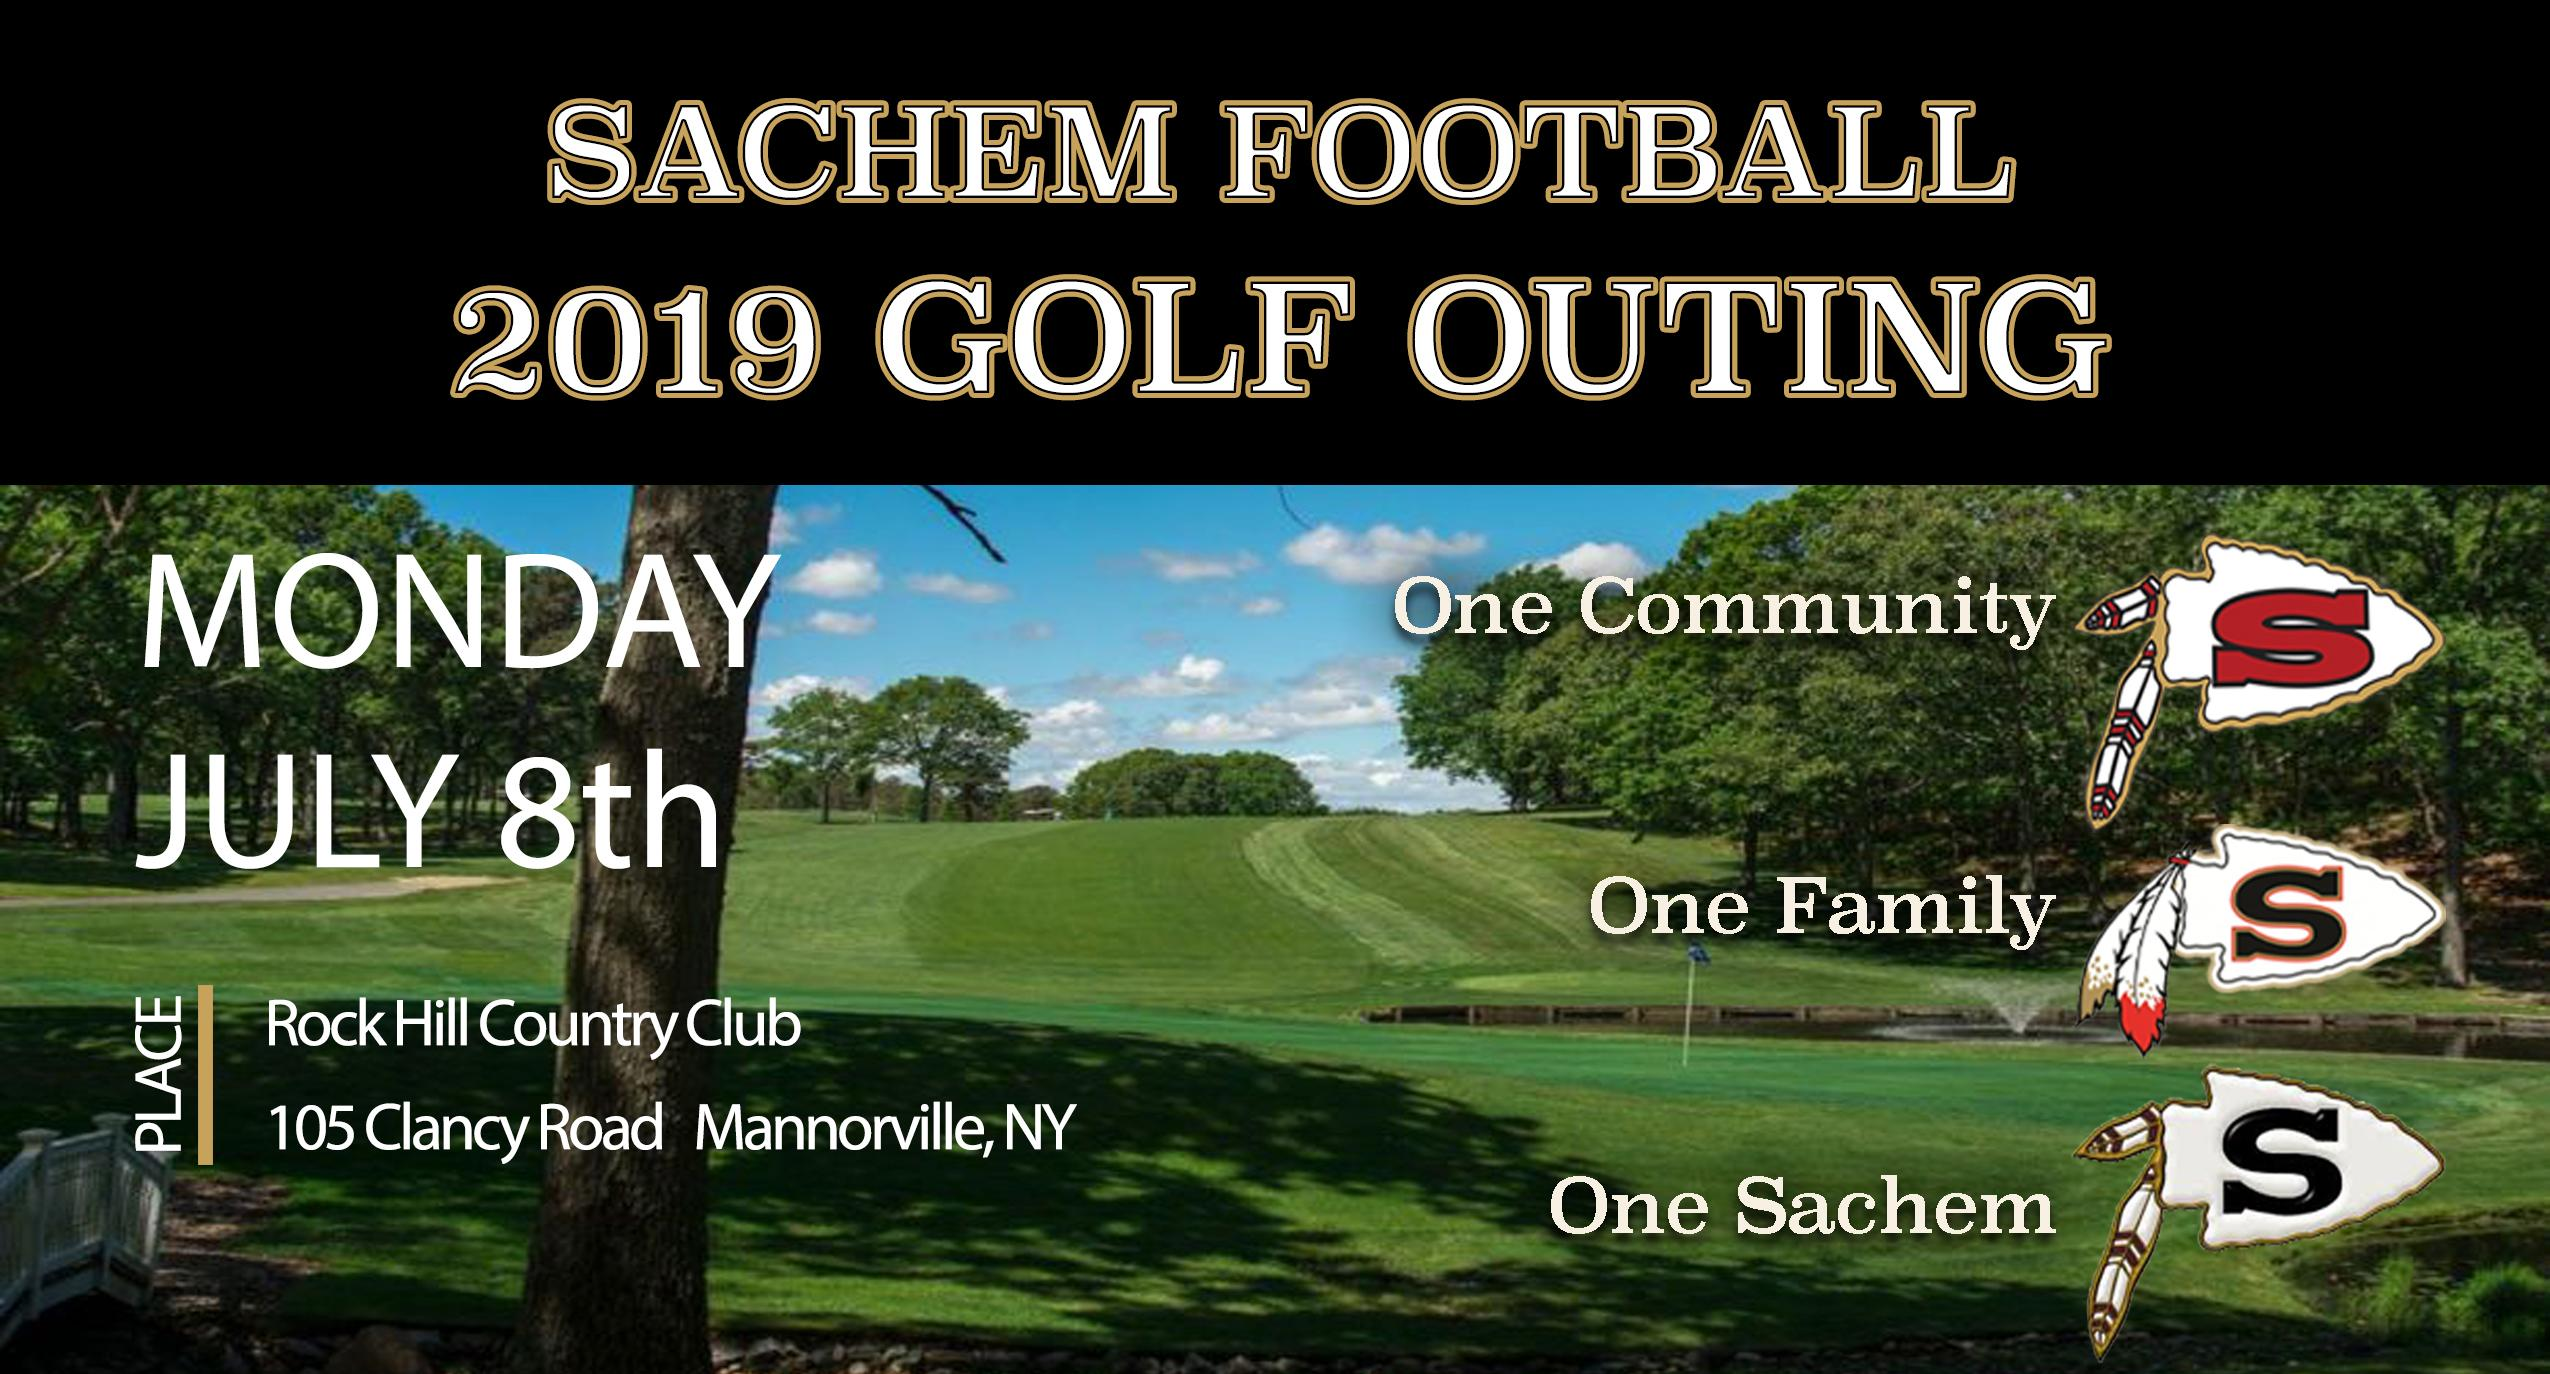 2019 Sachem Football Golf Outing